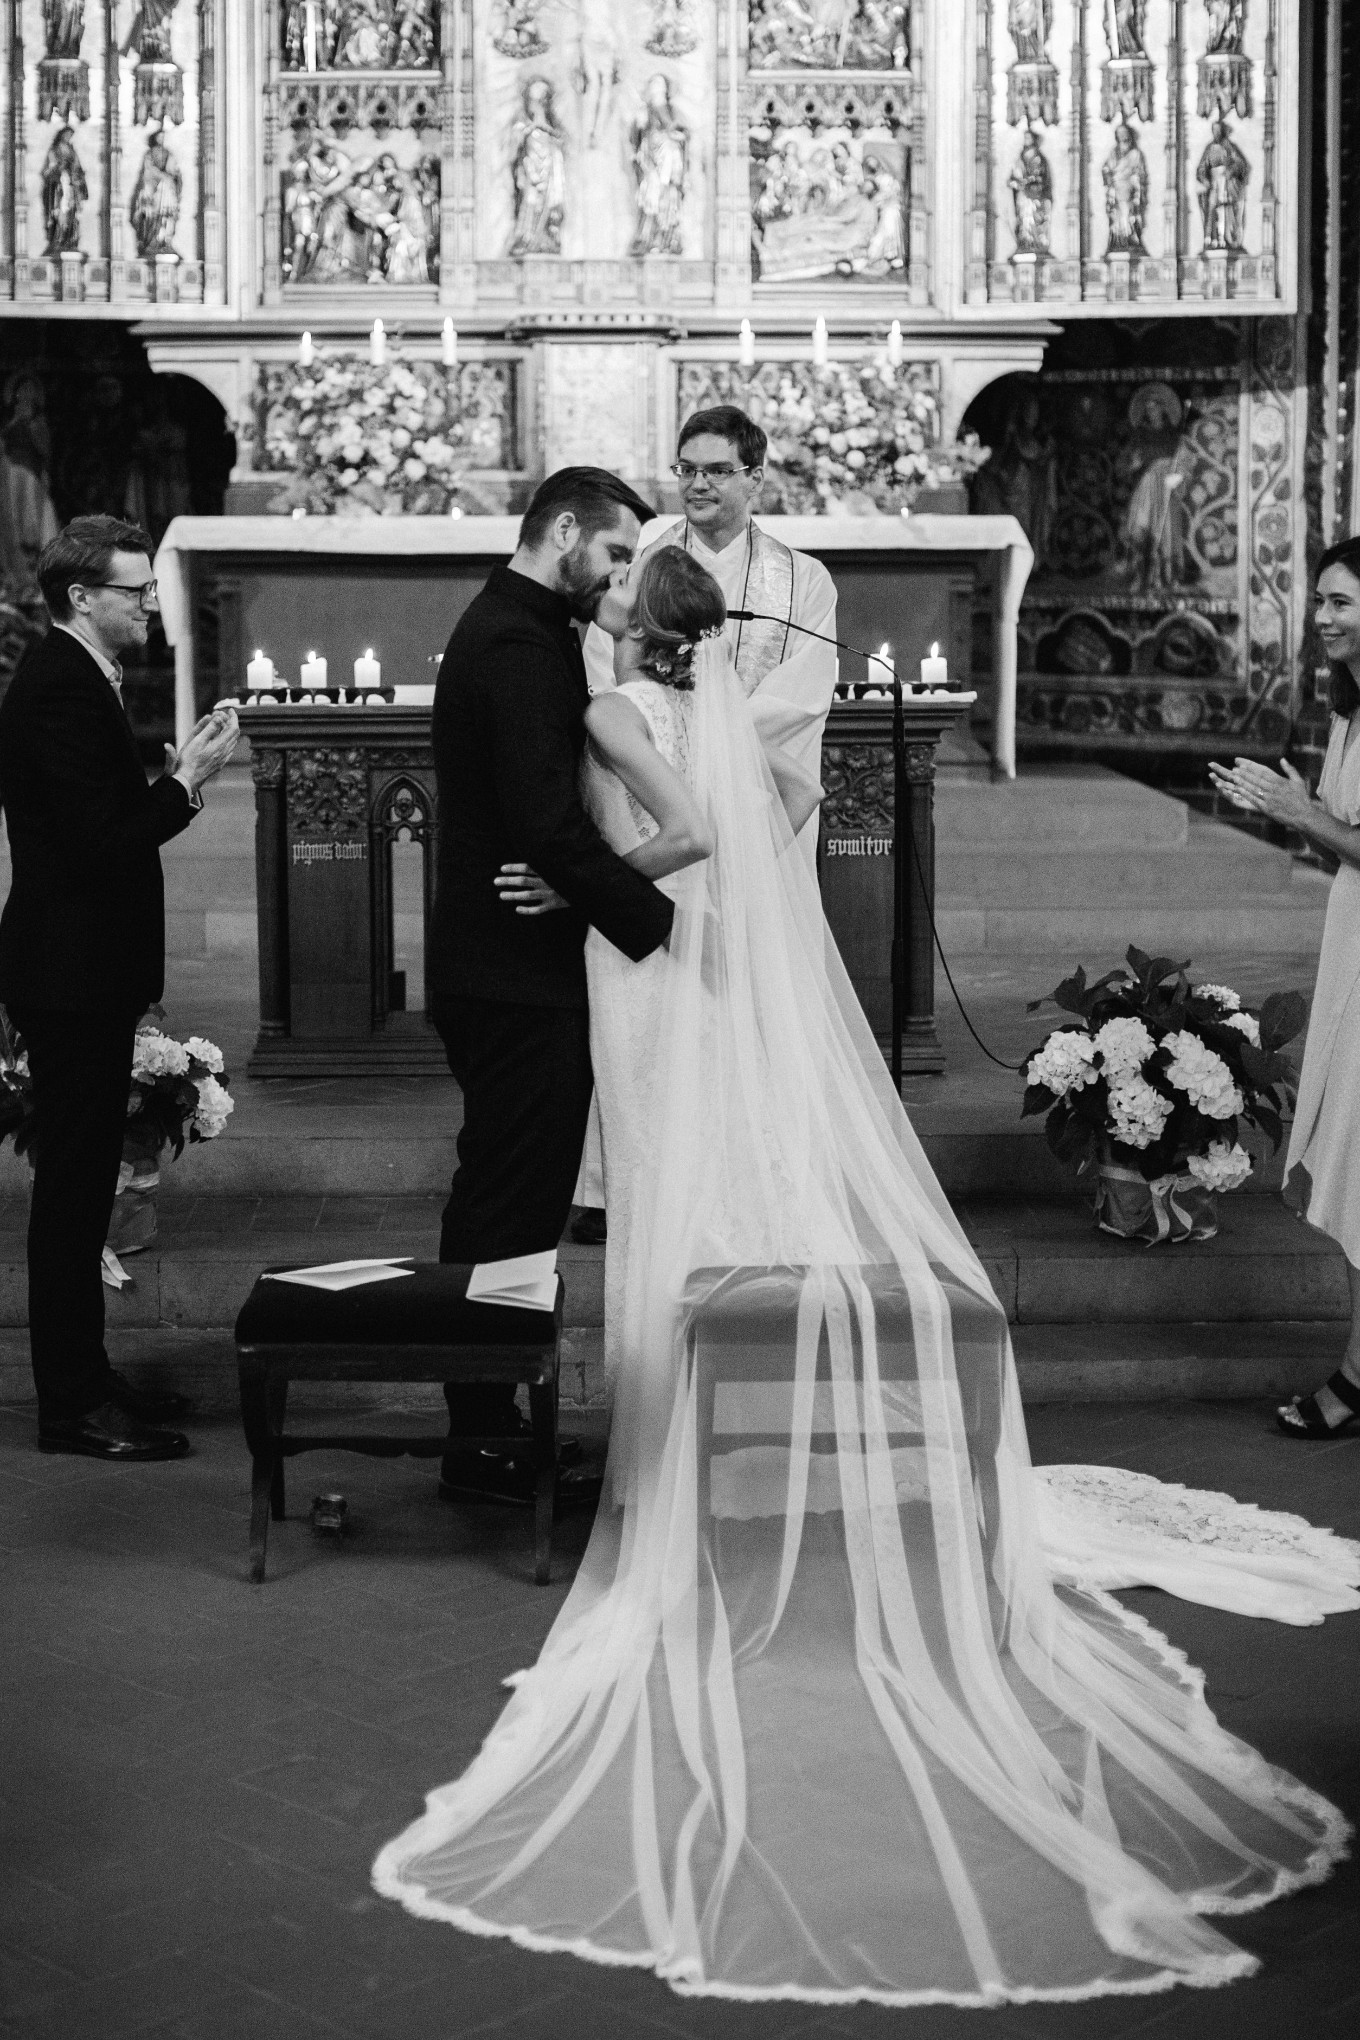 Berlin-Wannsee-Pia-Anna-Christian-Wedding-Photography-ST-22.jpg